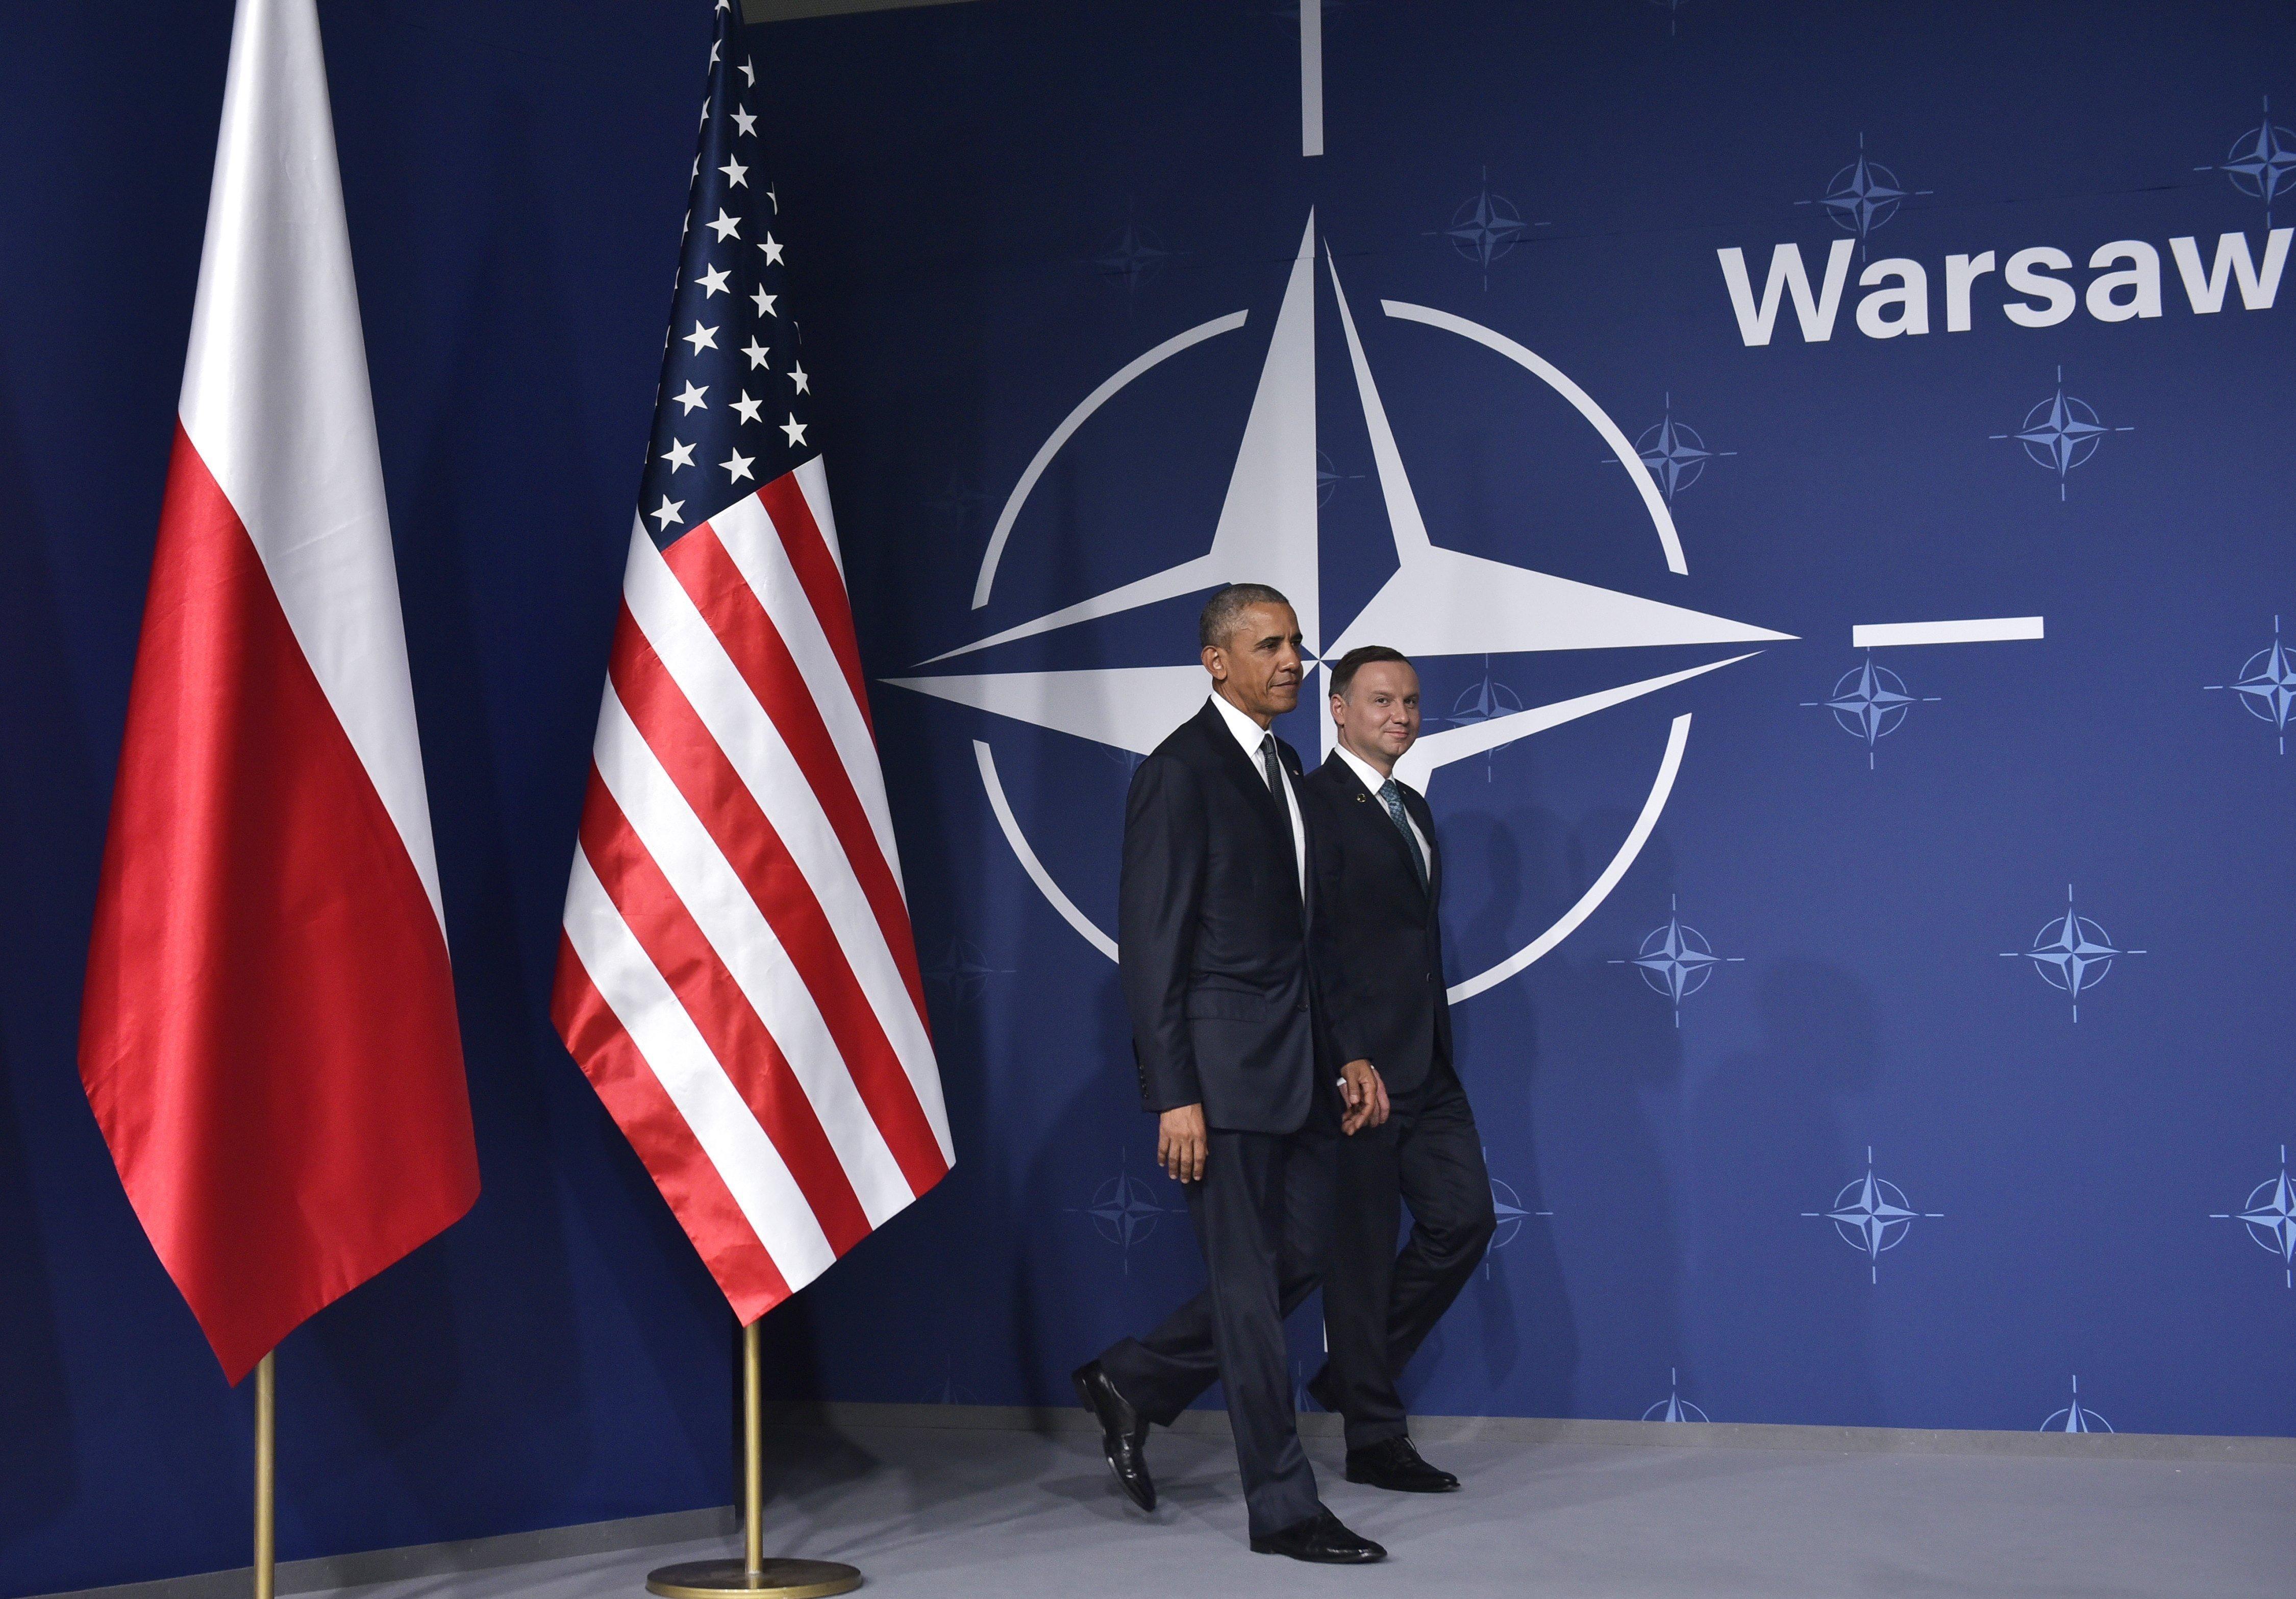 Sommet de l'Otan à Varsovie